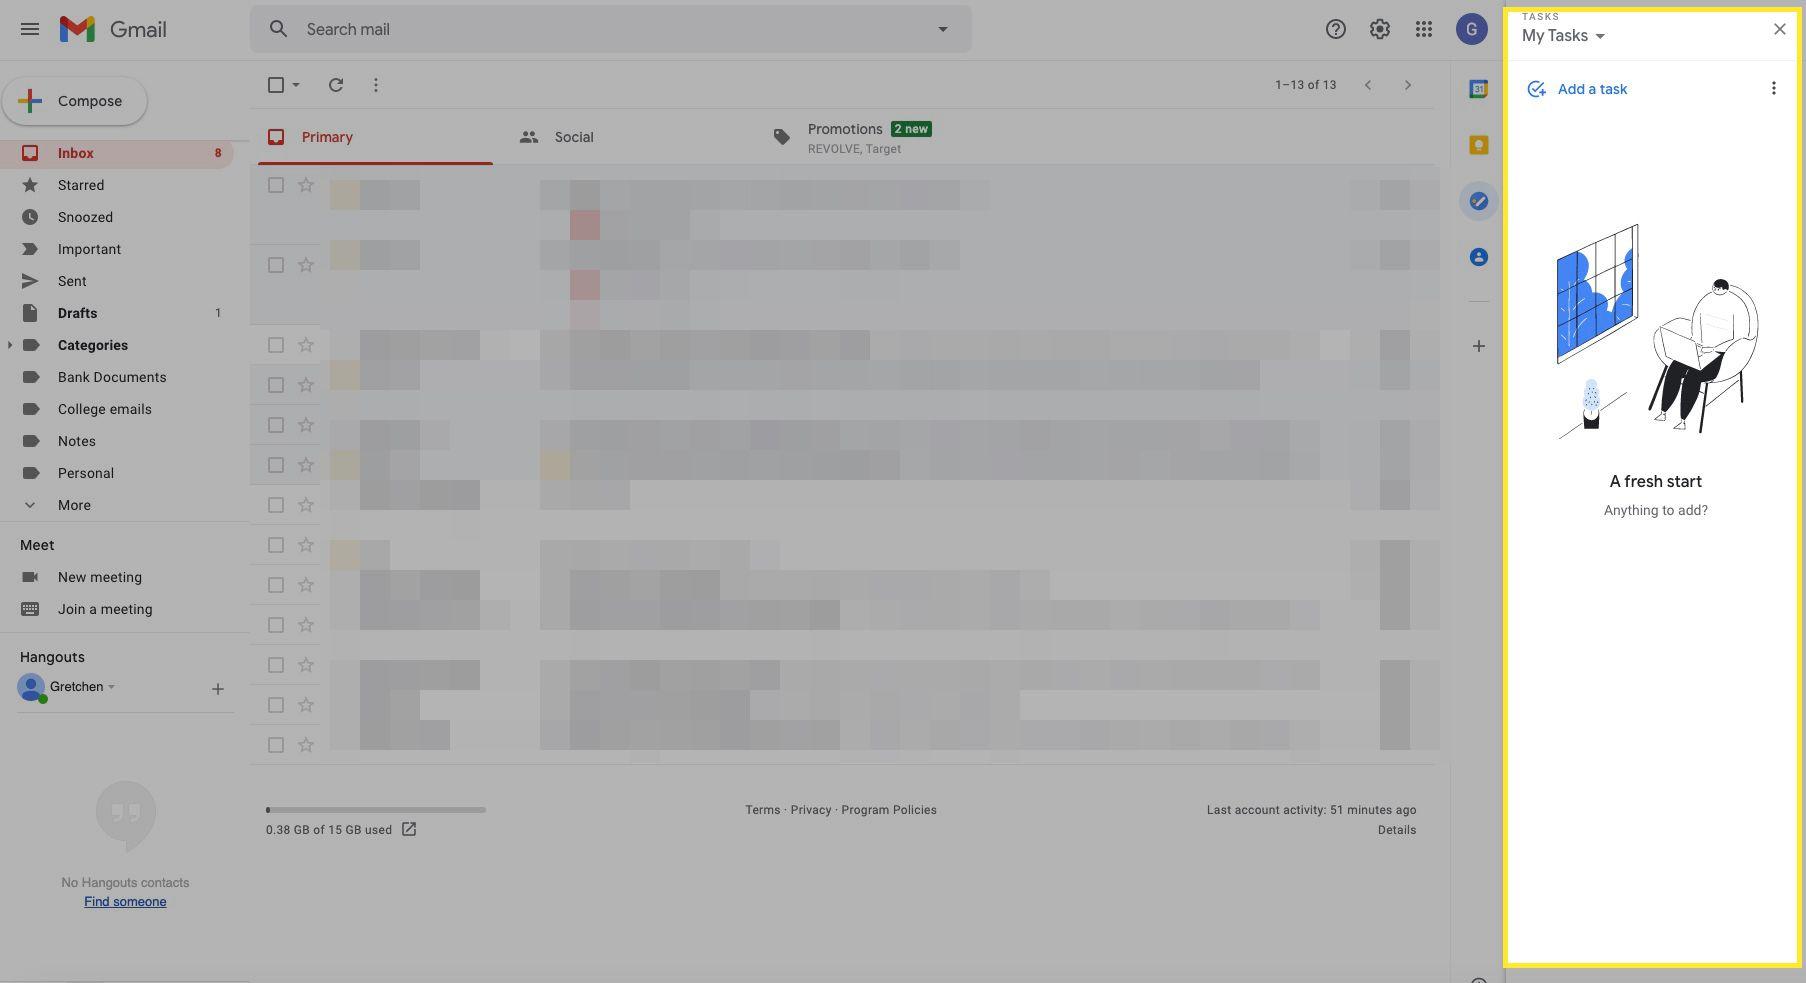 Gmail tasks screen